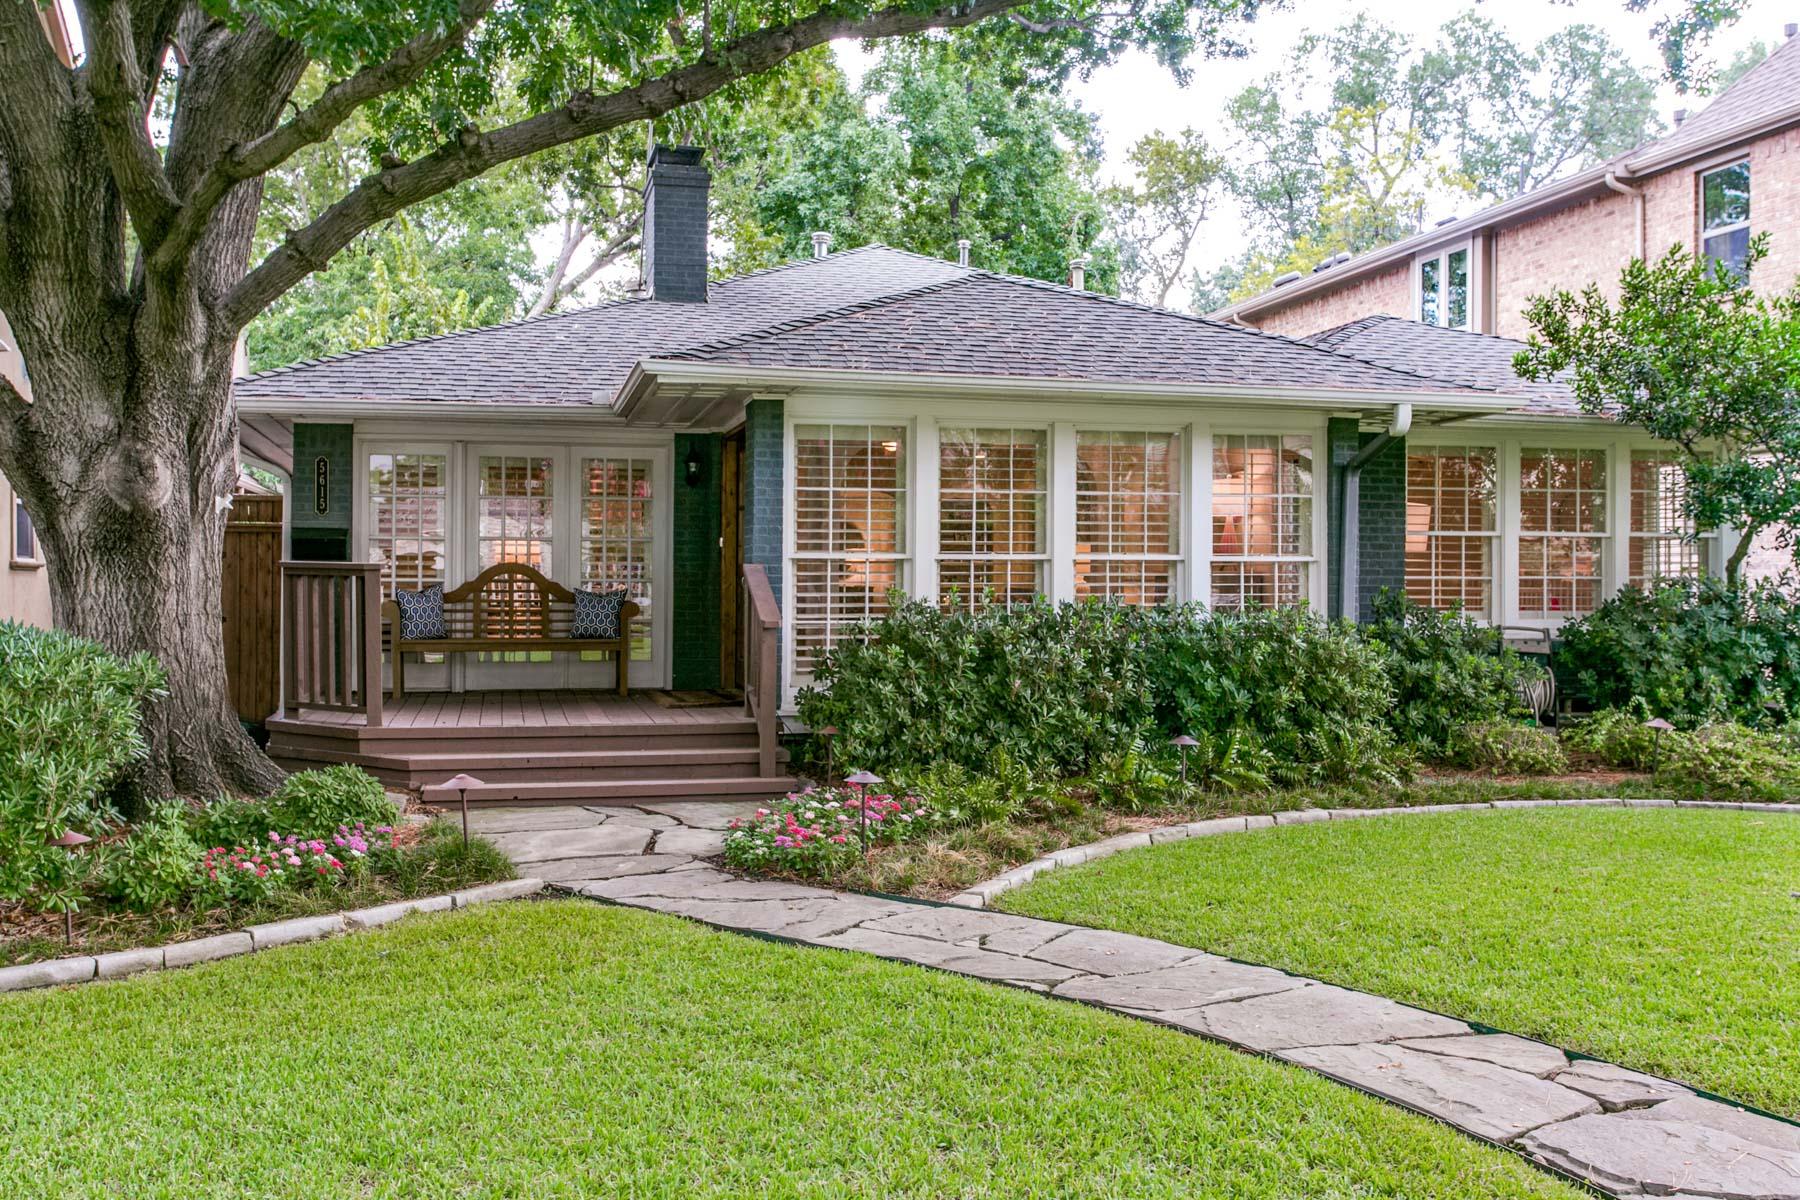 独户住宅 为 销售 在 Pristine Devonshire Cottage 5615 W. Hanover Avenue 达拉斯, 得克萨斯州, 75209 美国